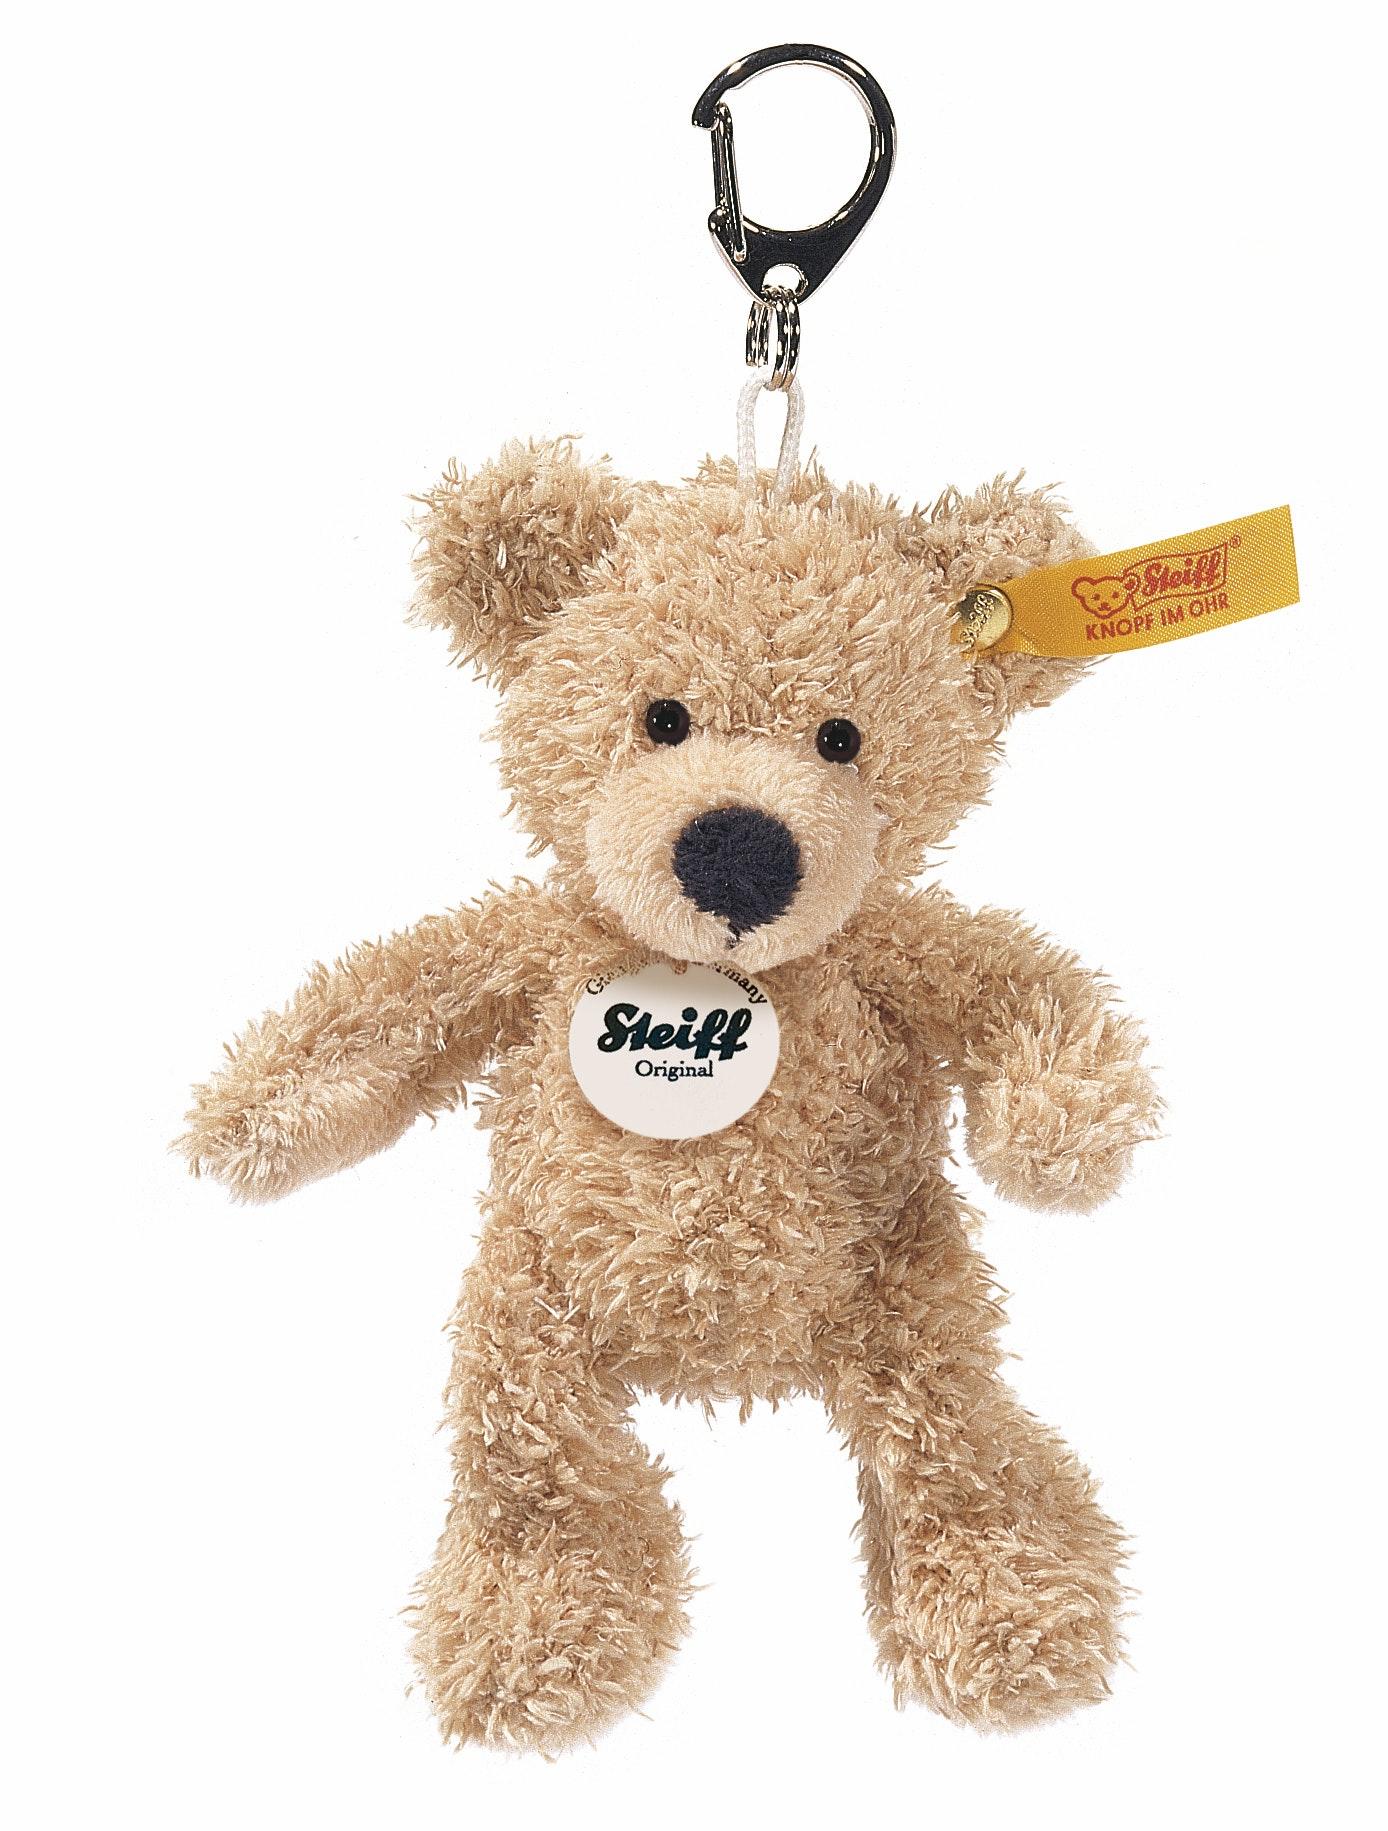 Steiff keyring fynn teddy bear 111600 portrait jpg